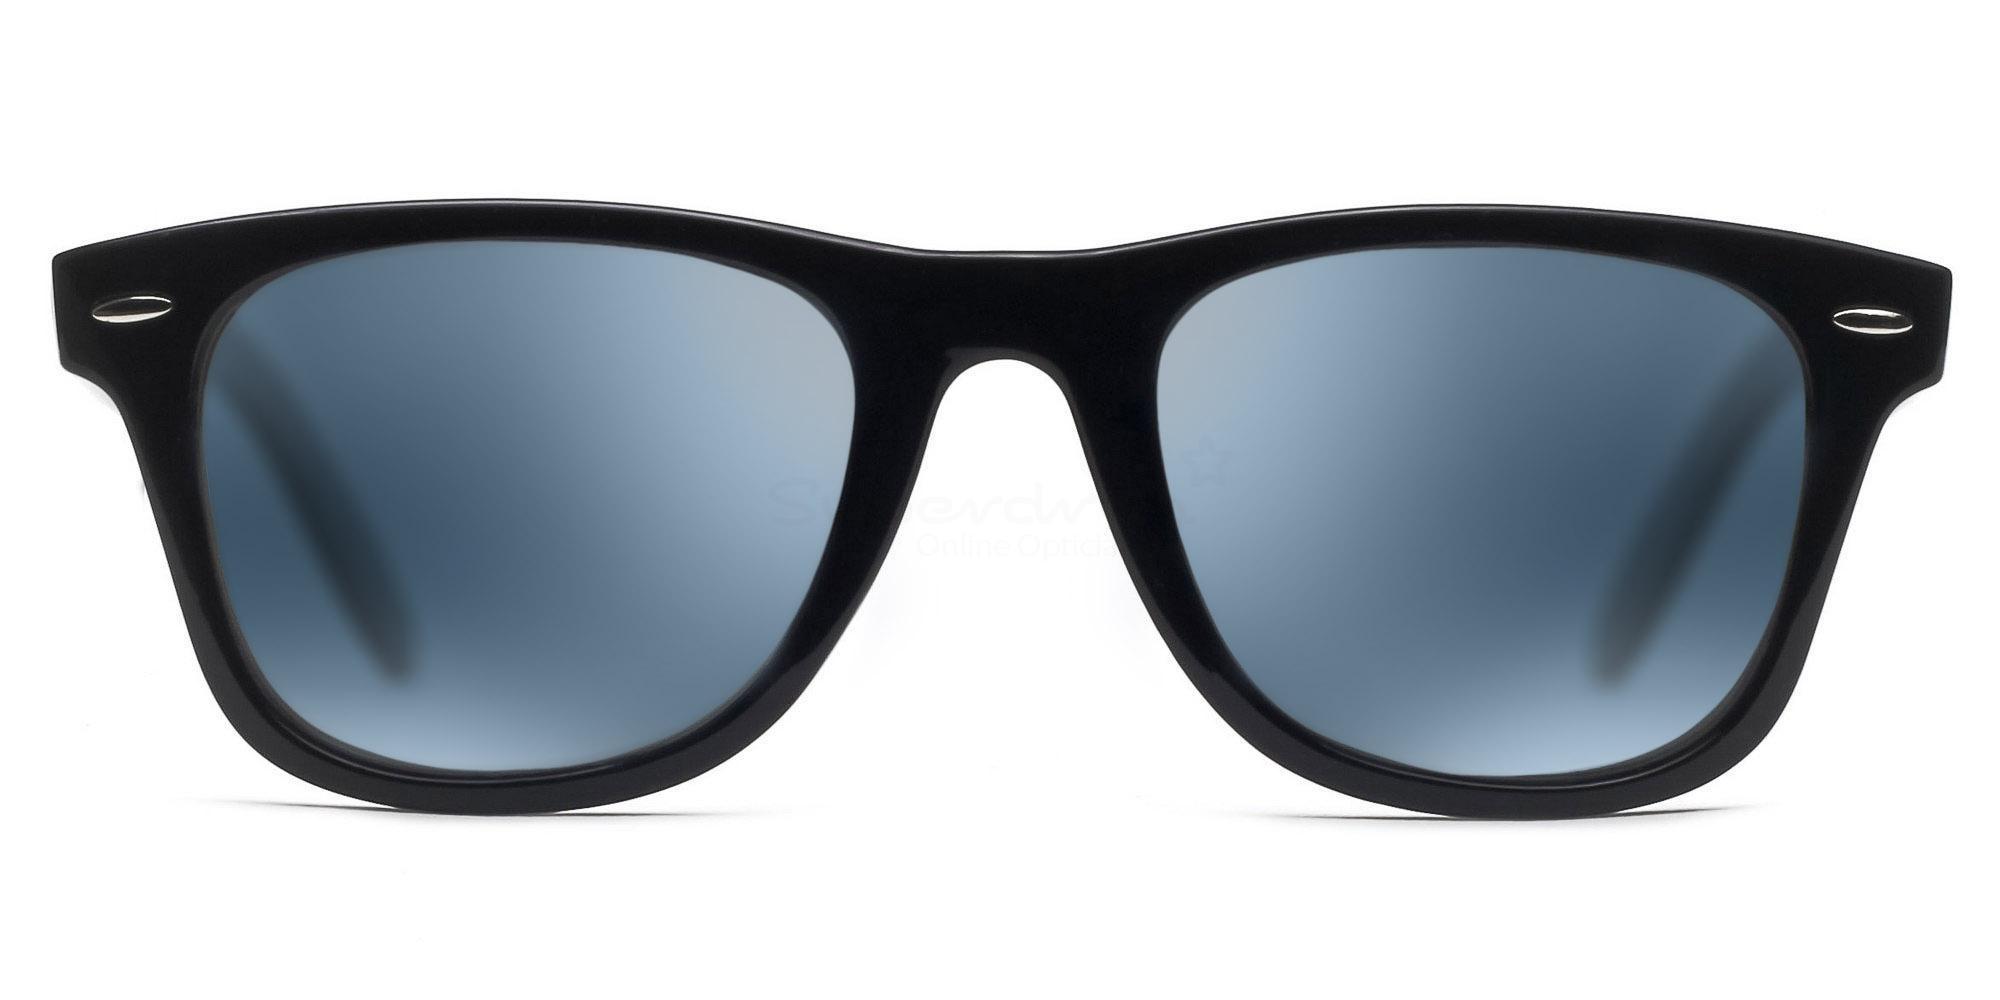 C01 Polarized Grey with Silver Mirror P2429 - Black (Mirrored Polarized) Sunglasses, Neon